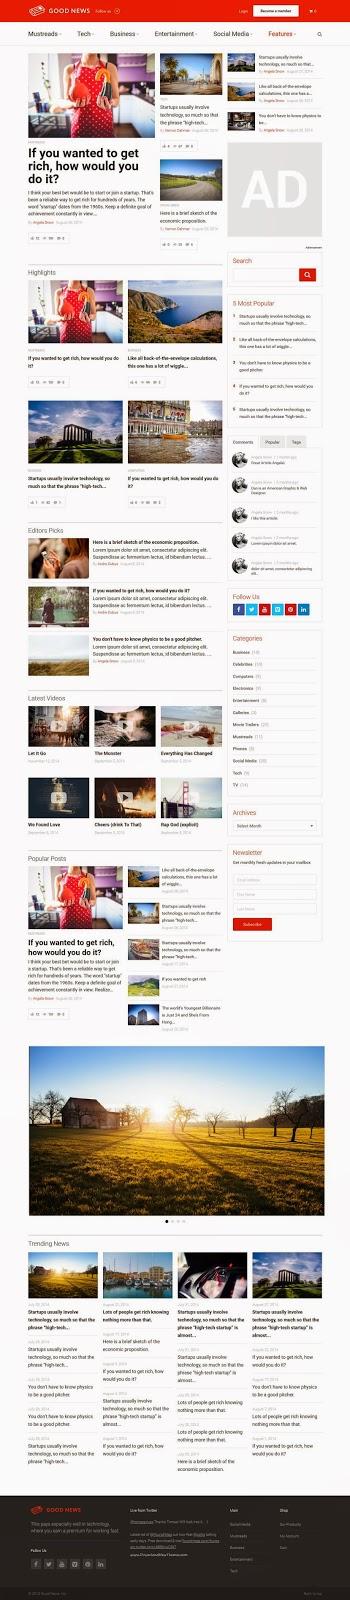 Free Responsive News Magazine Blog WP Theme 2015